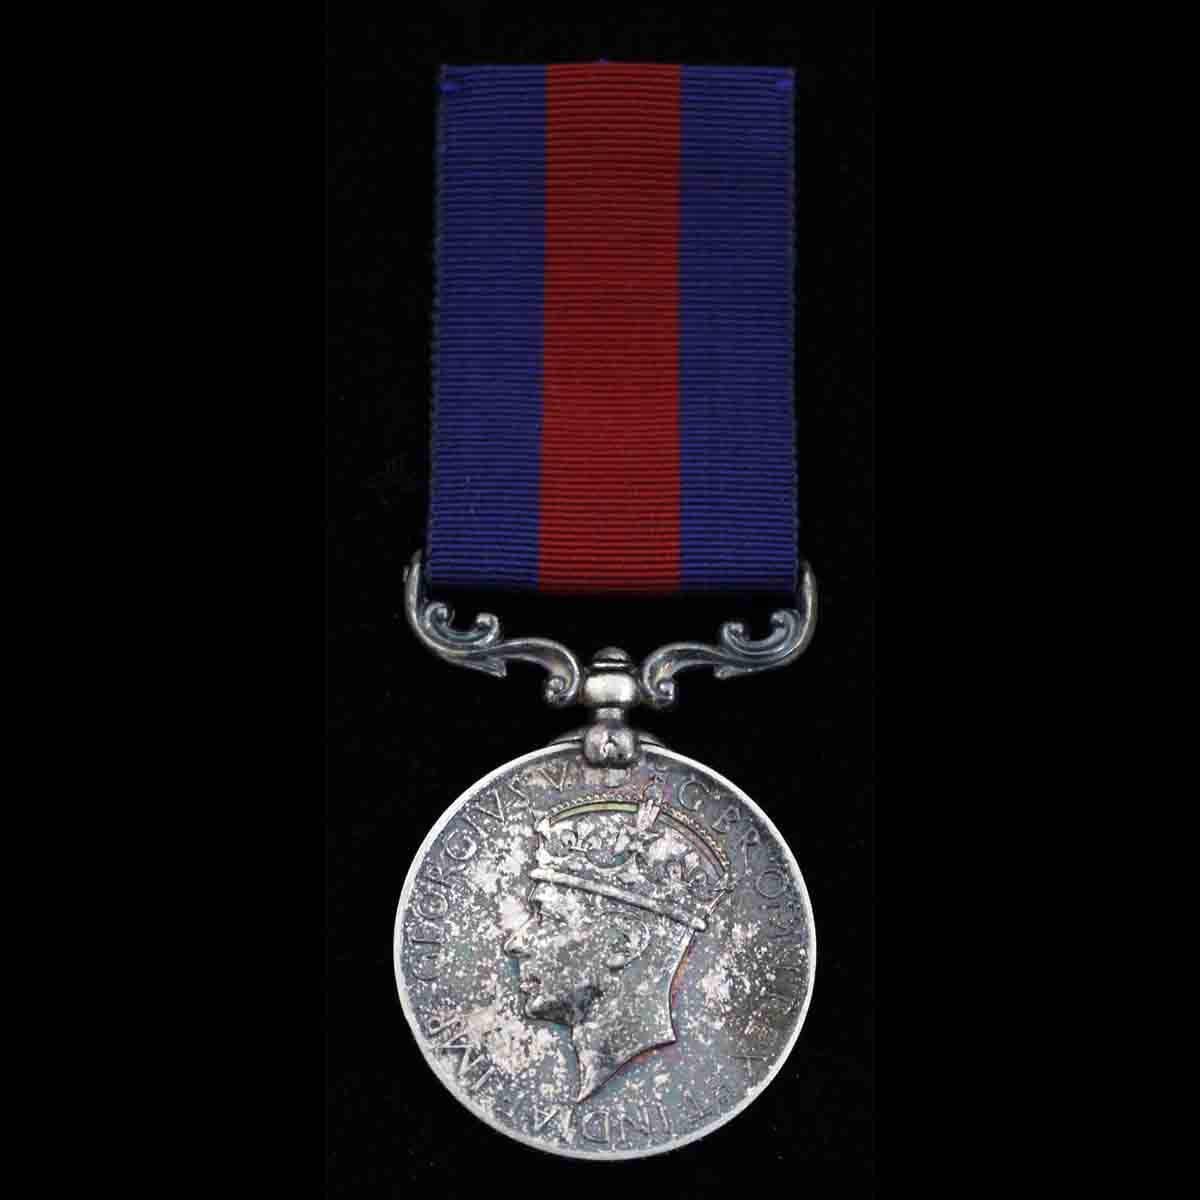 IDSM Arakan Burma 1943 14/12th FFR 1